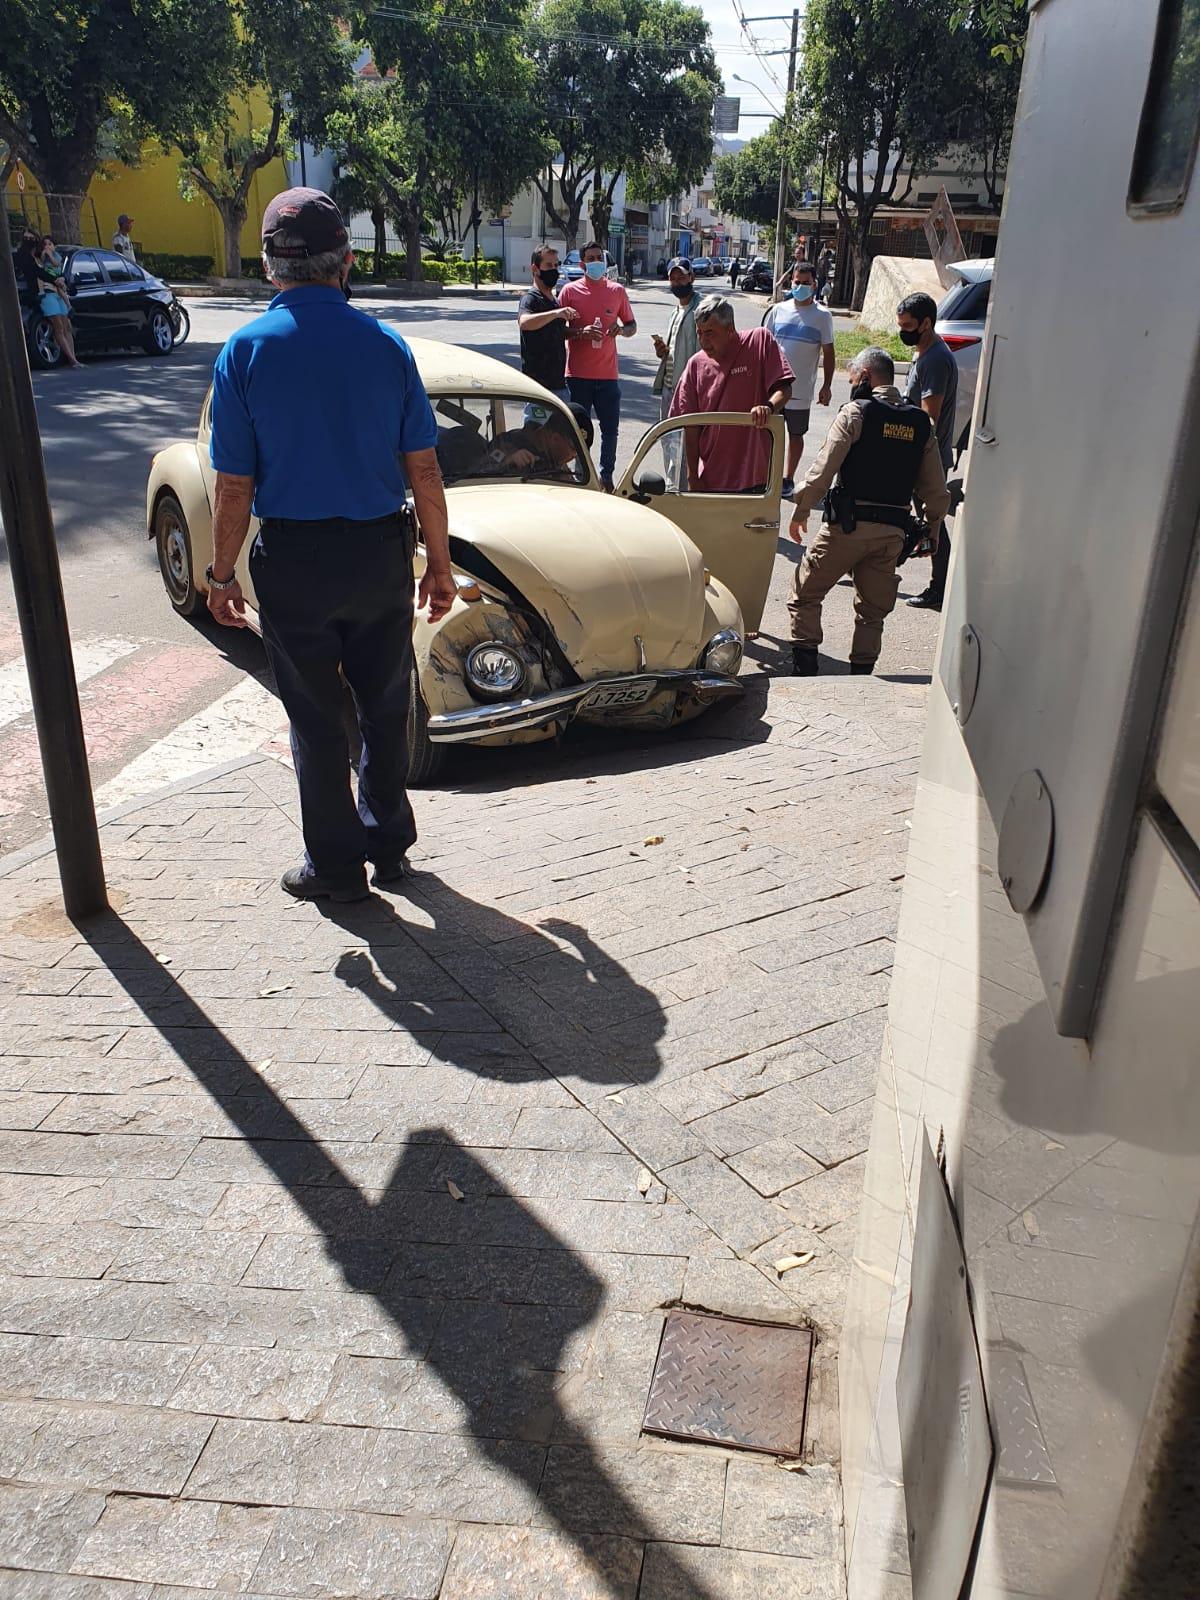 MOTORISTA BÊBADO BATE  FUSCA NA PORTA DE BANCO NO CENTRO